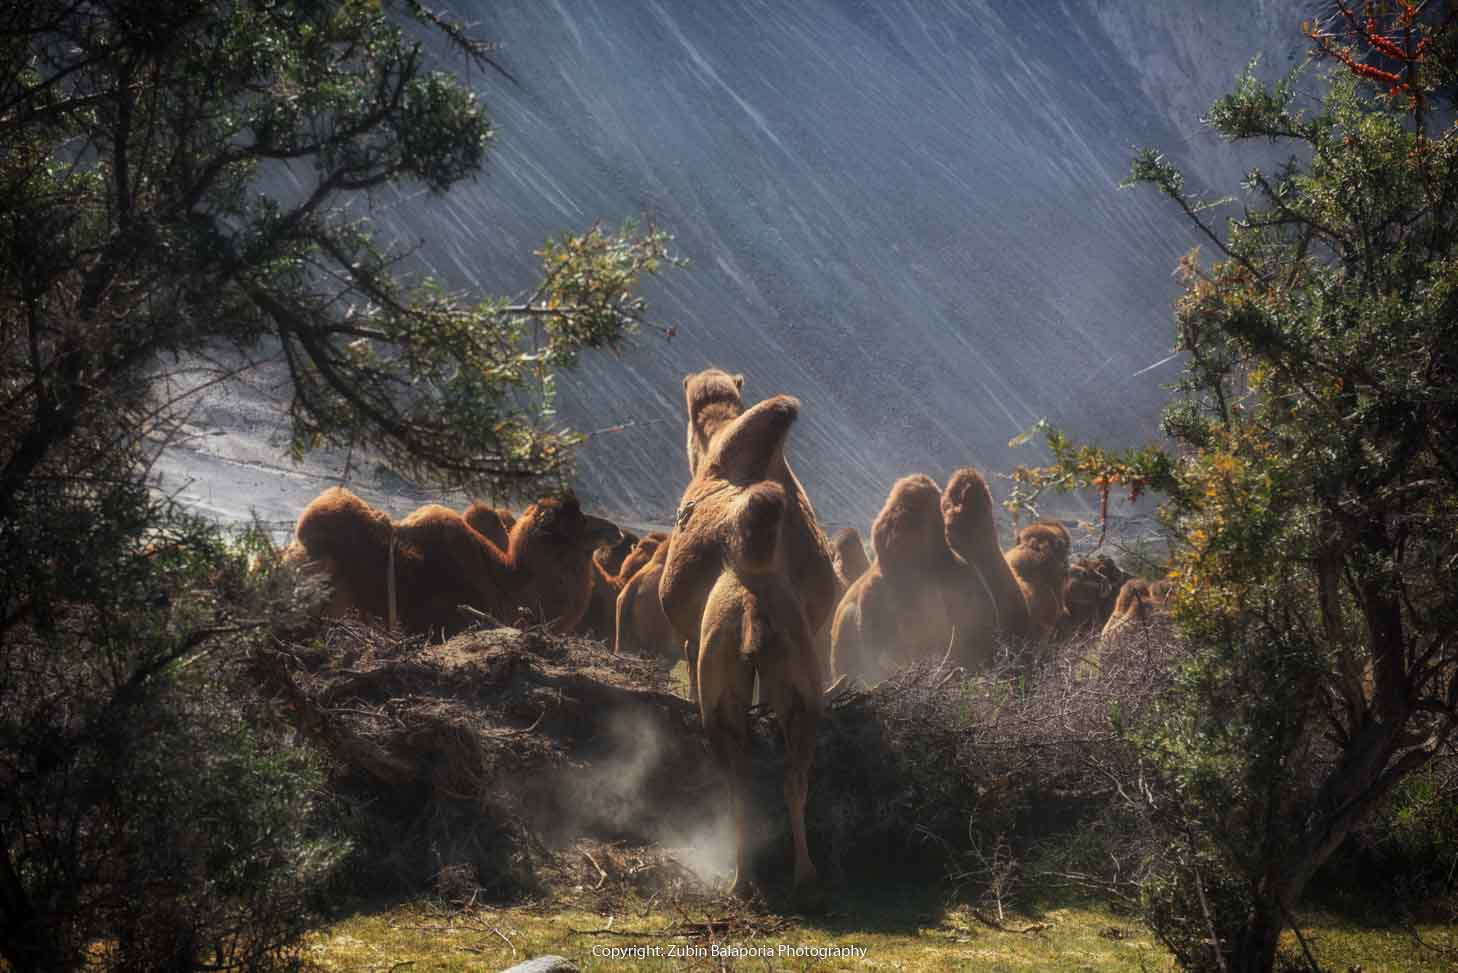 Camel Hump Hurdle